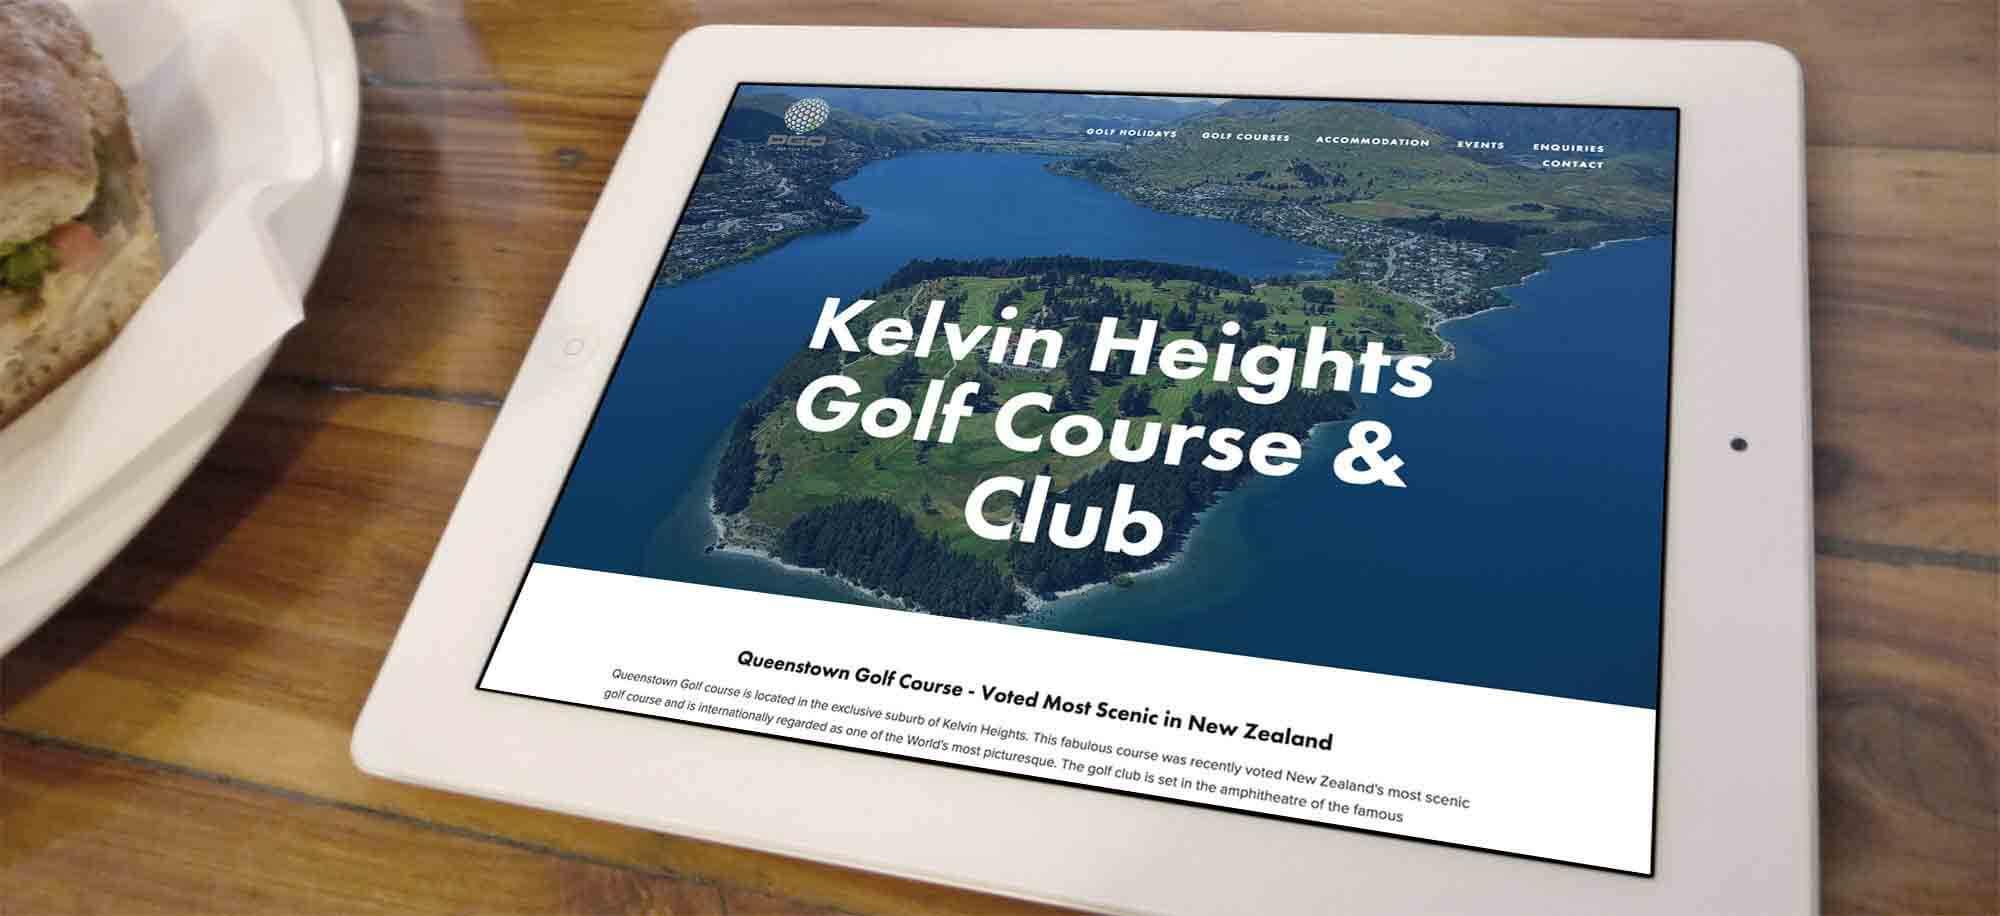 Peak Golf Mobile First Website